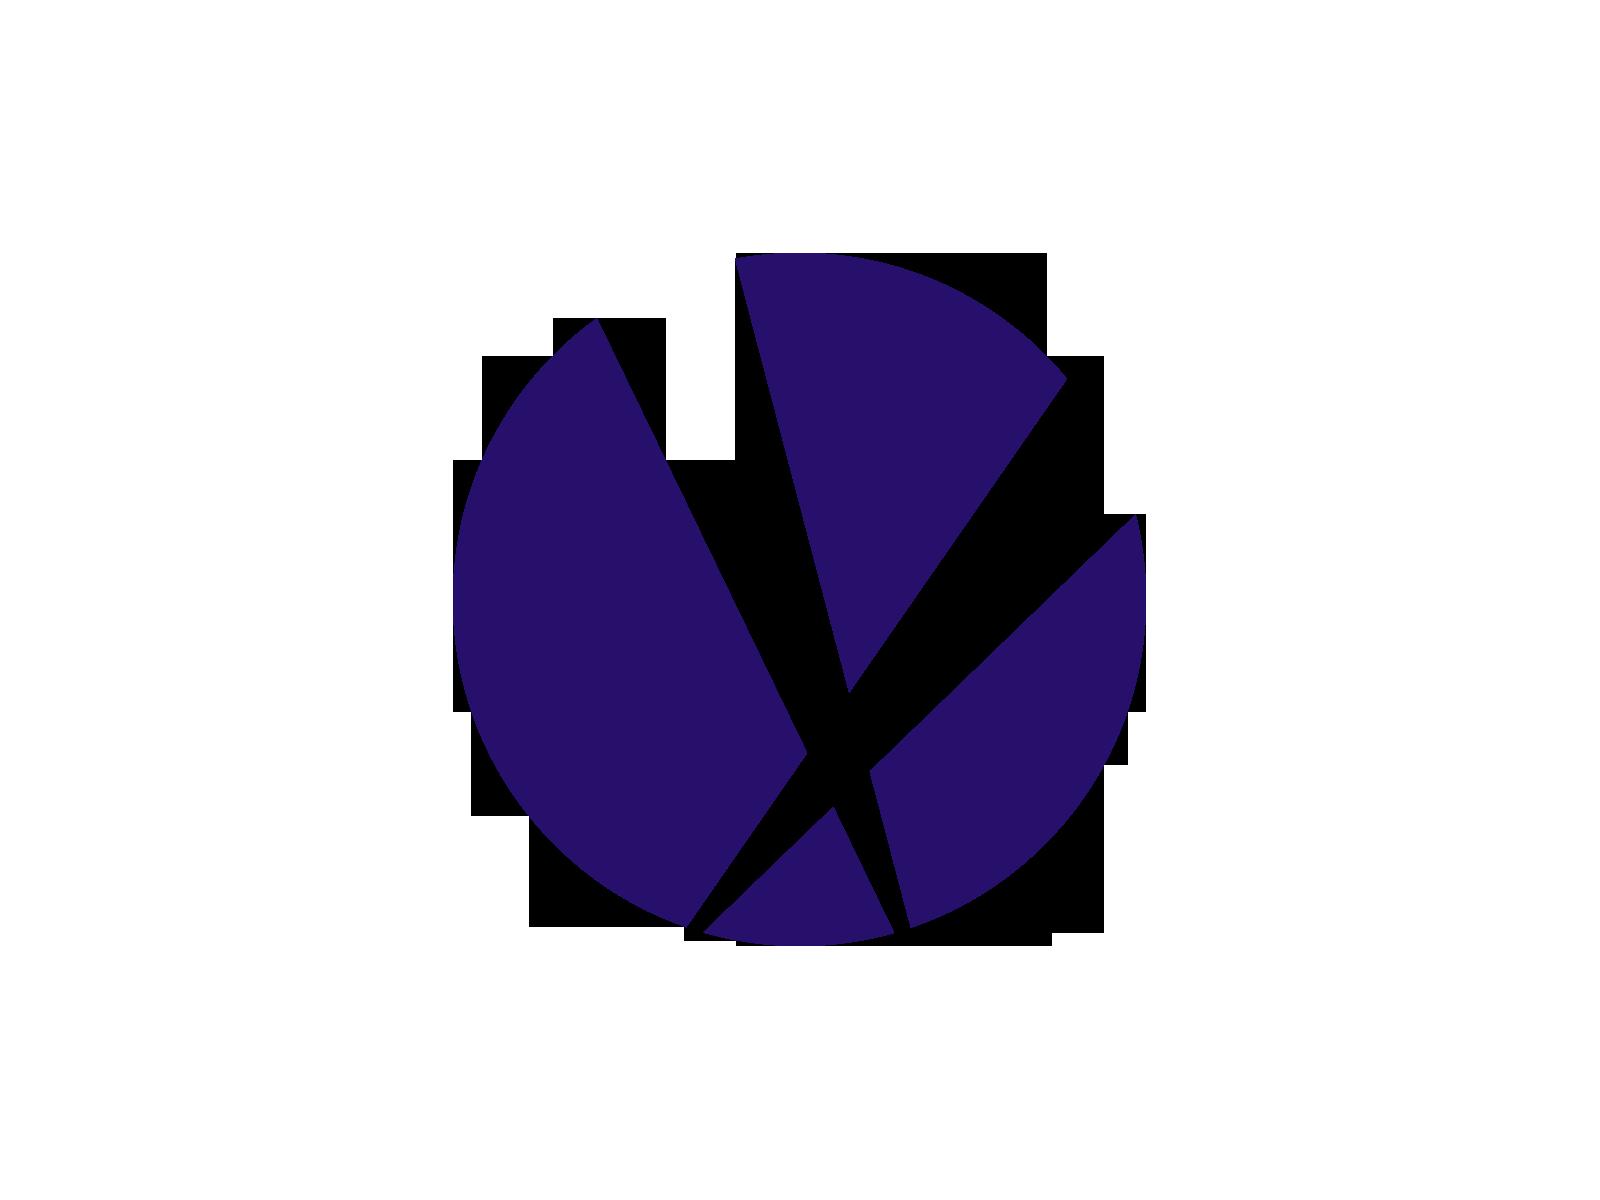 21st-Century-Fox-logo-Searchlight.png - Logo 21st Century Fox PNG